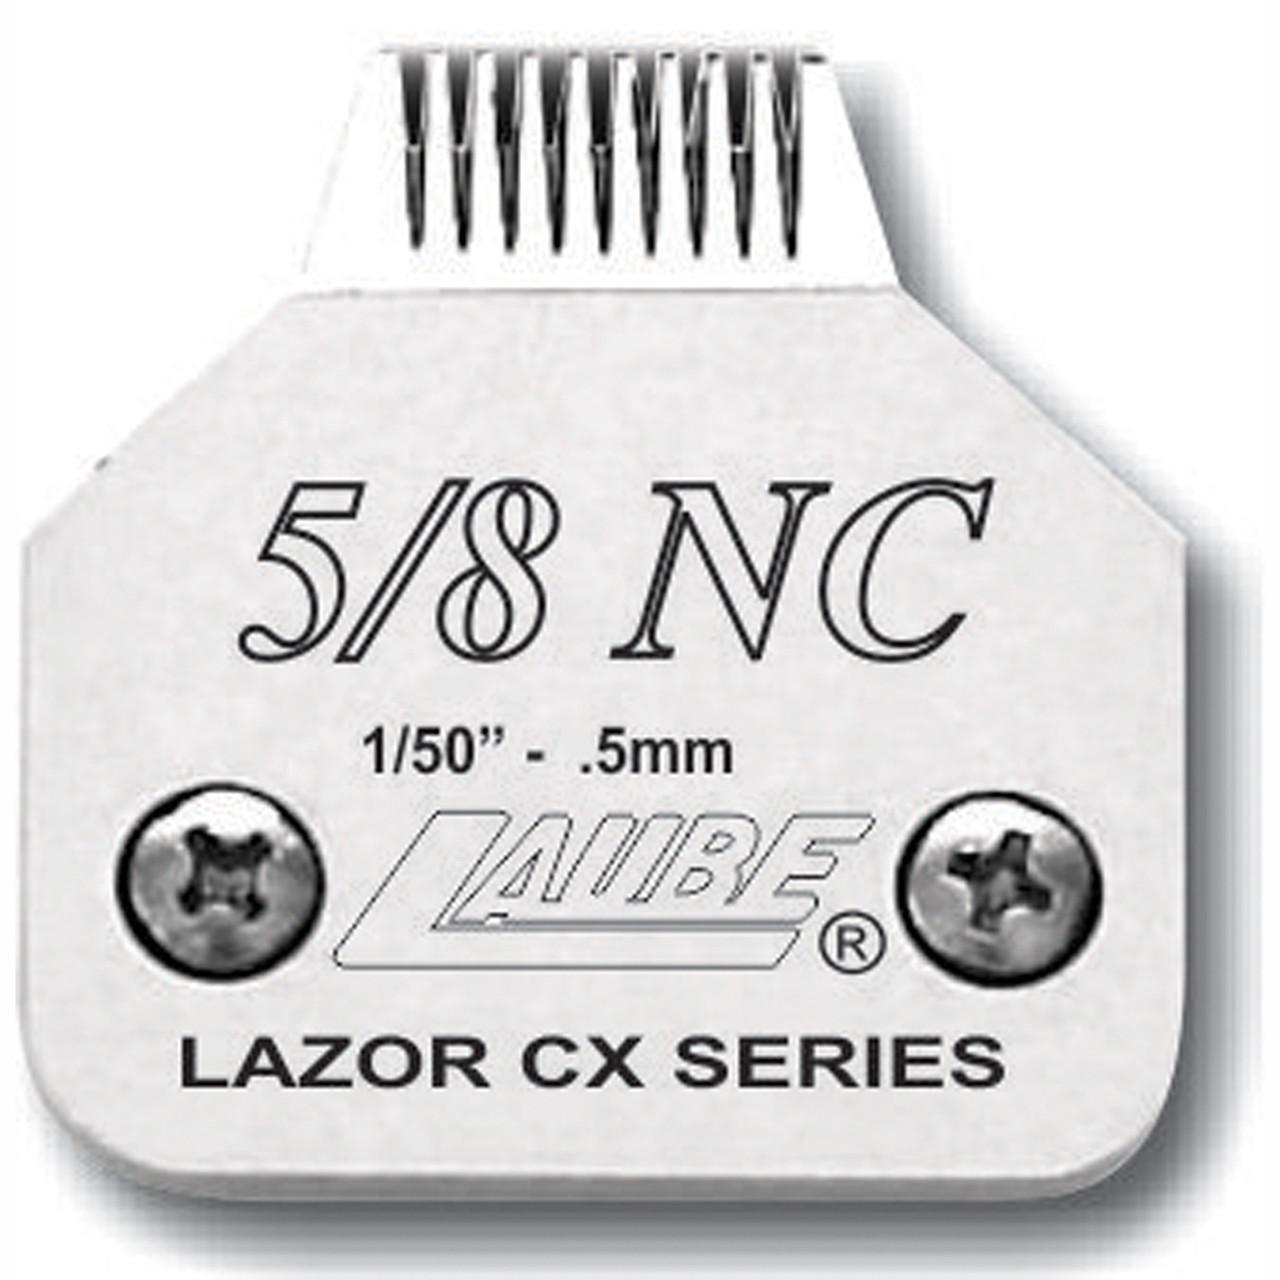 laube cx blade 5/8 NC